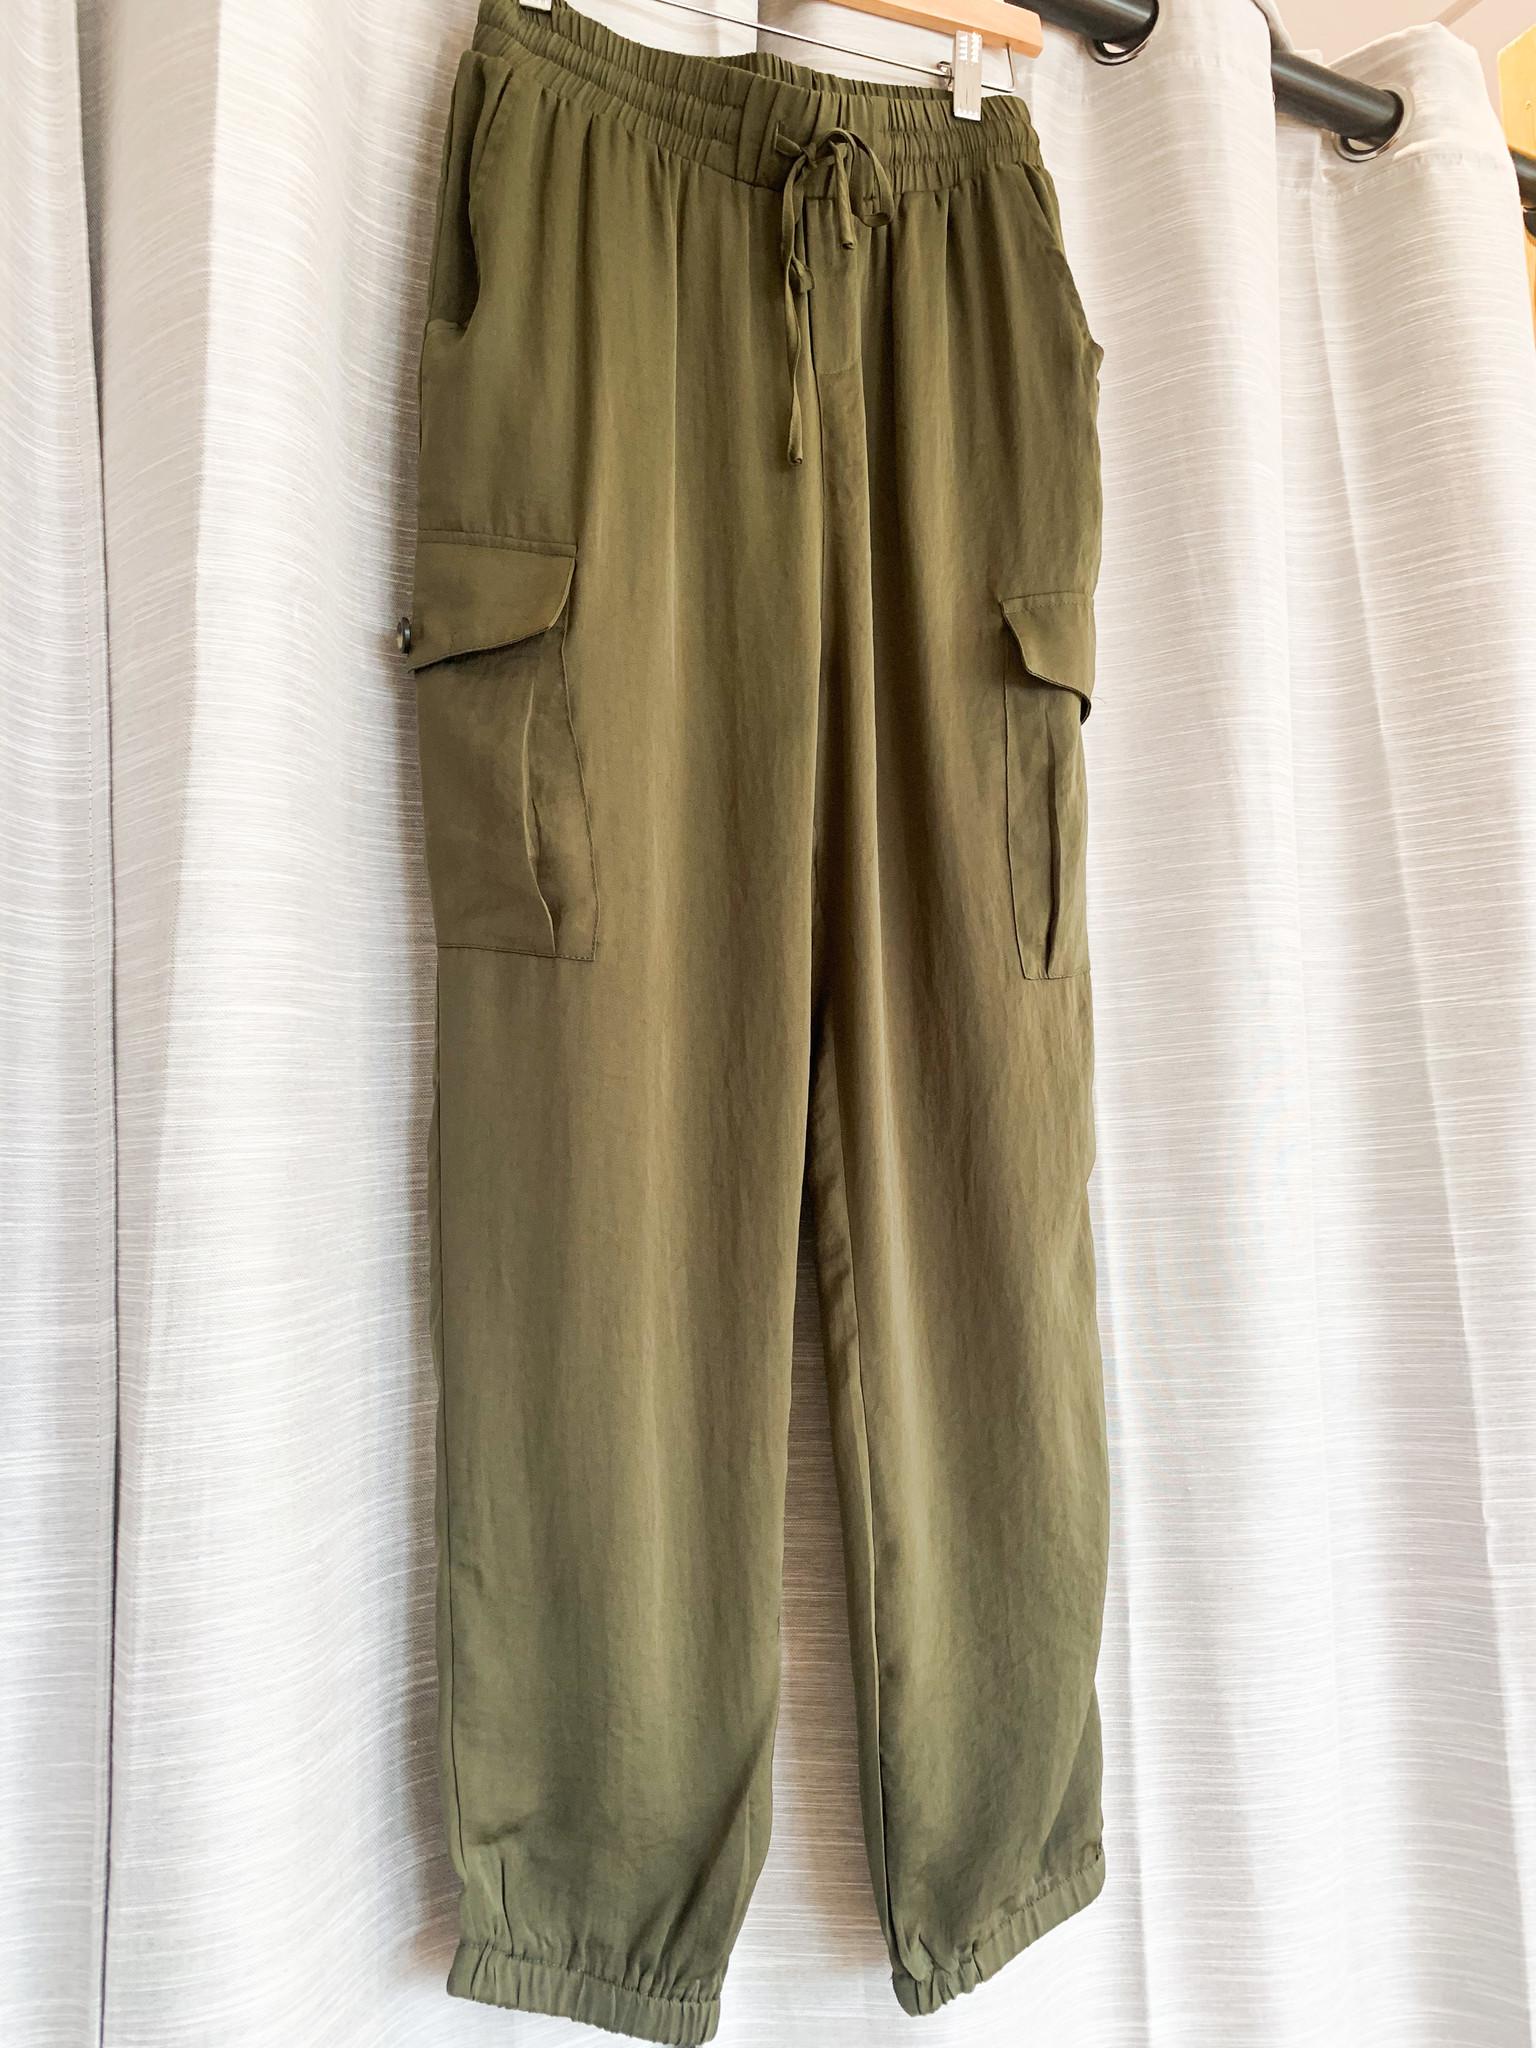 Olive Cargo Pants